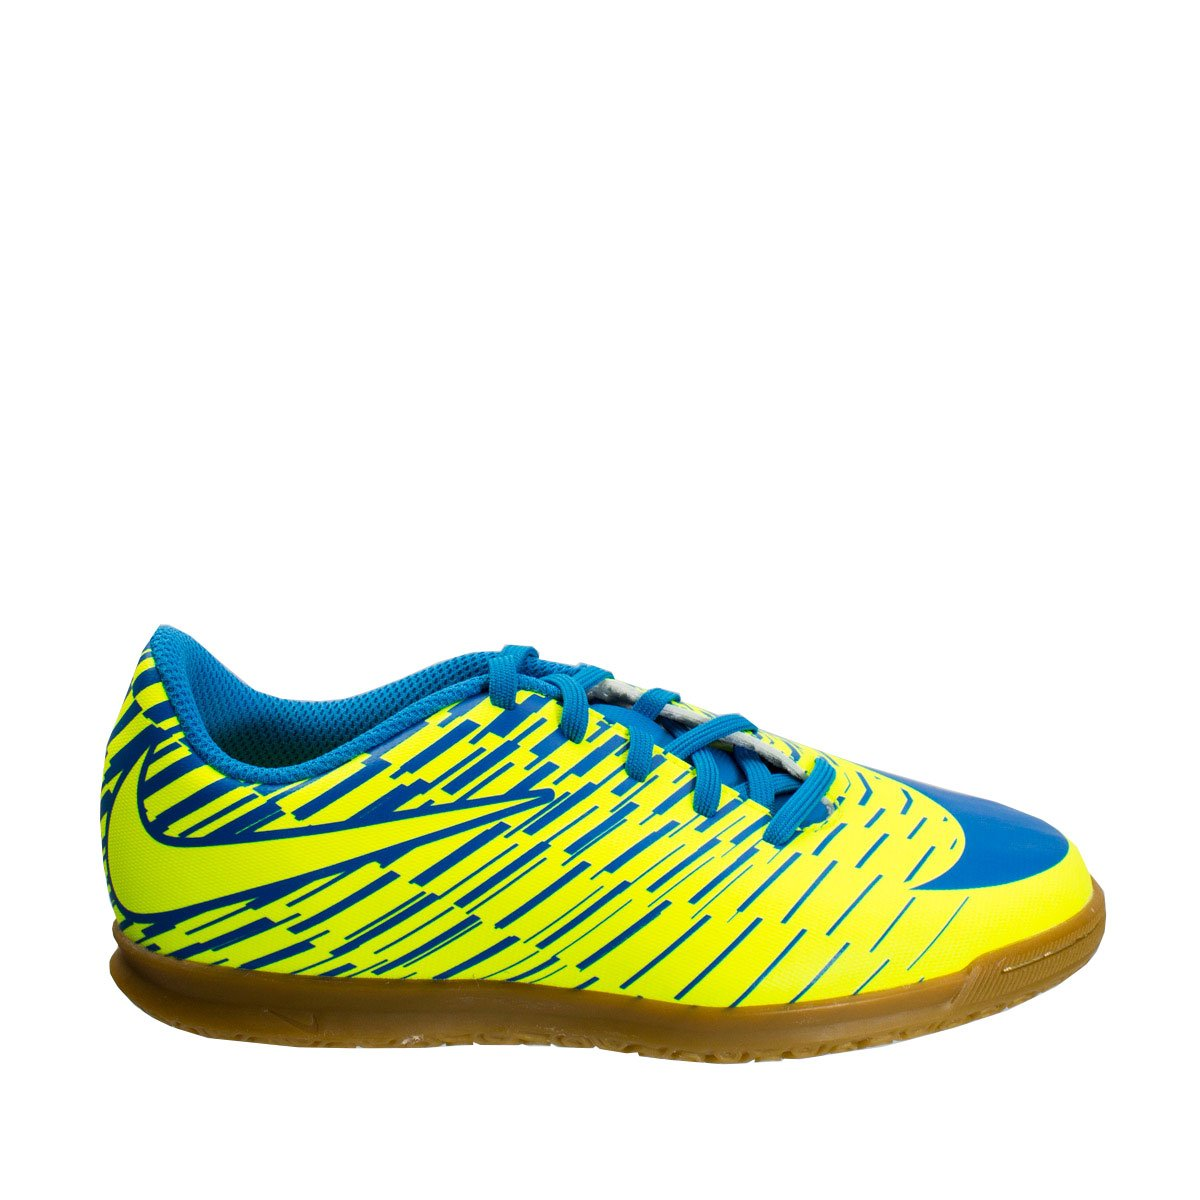 Bizz Store - Chuteira Infantil Futsal Nike Bravata II IC JR dc03db7ee5ae8